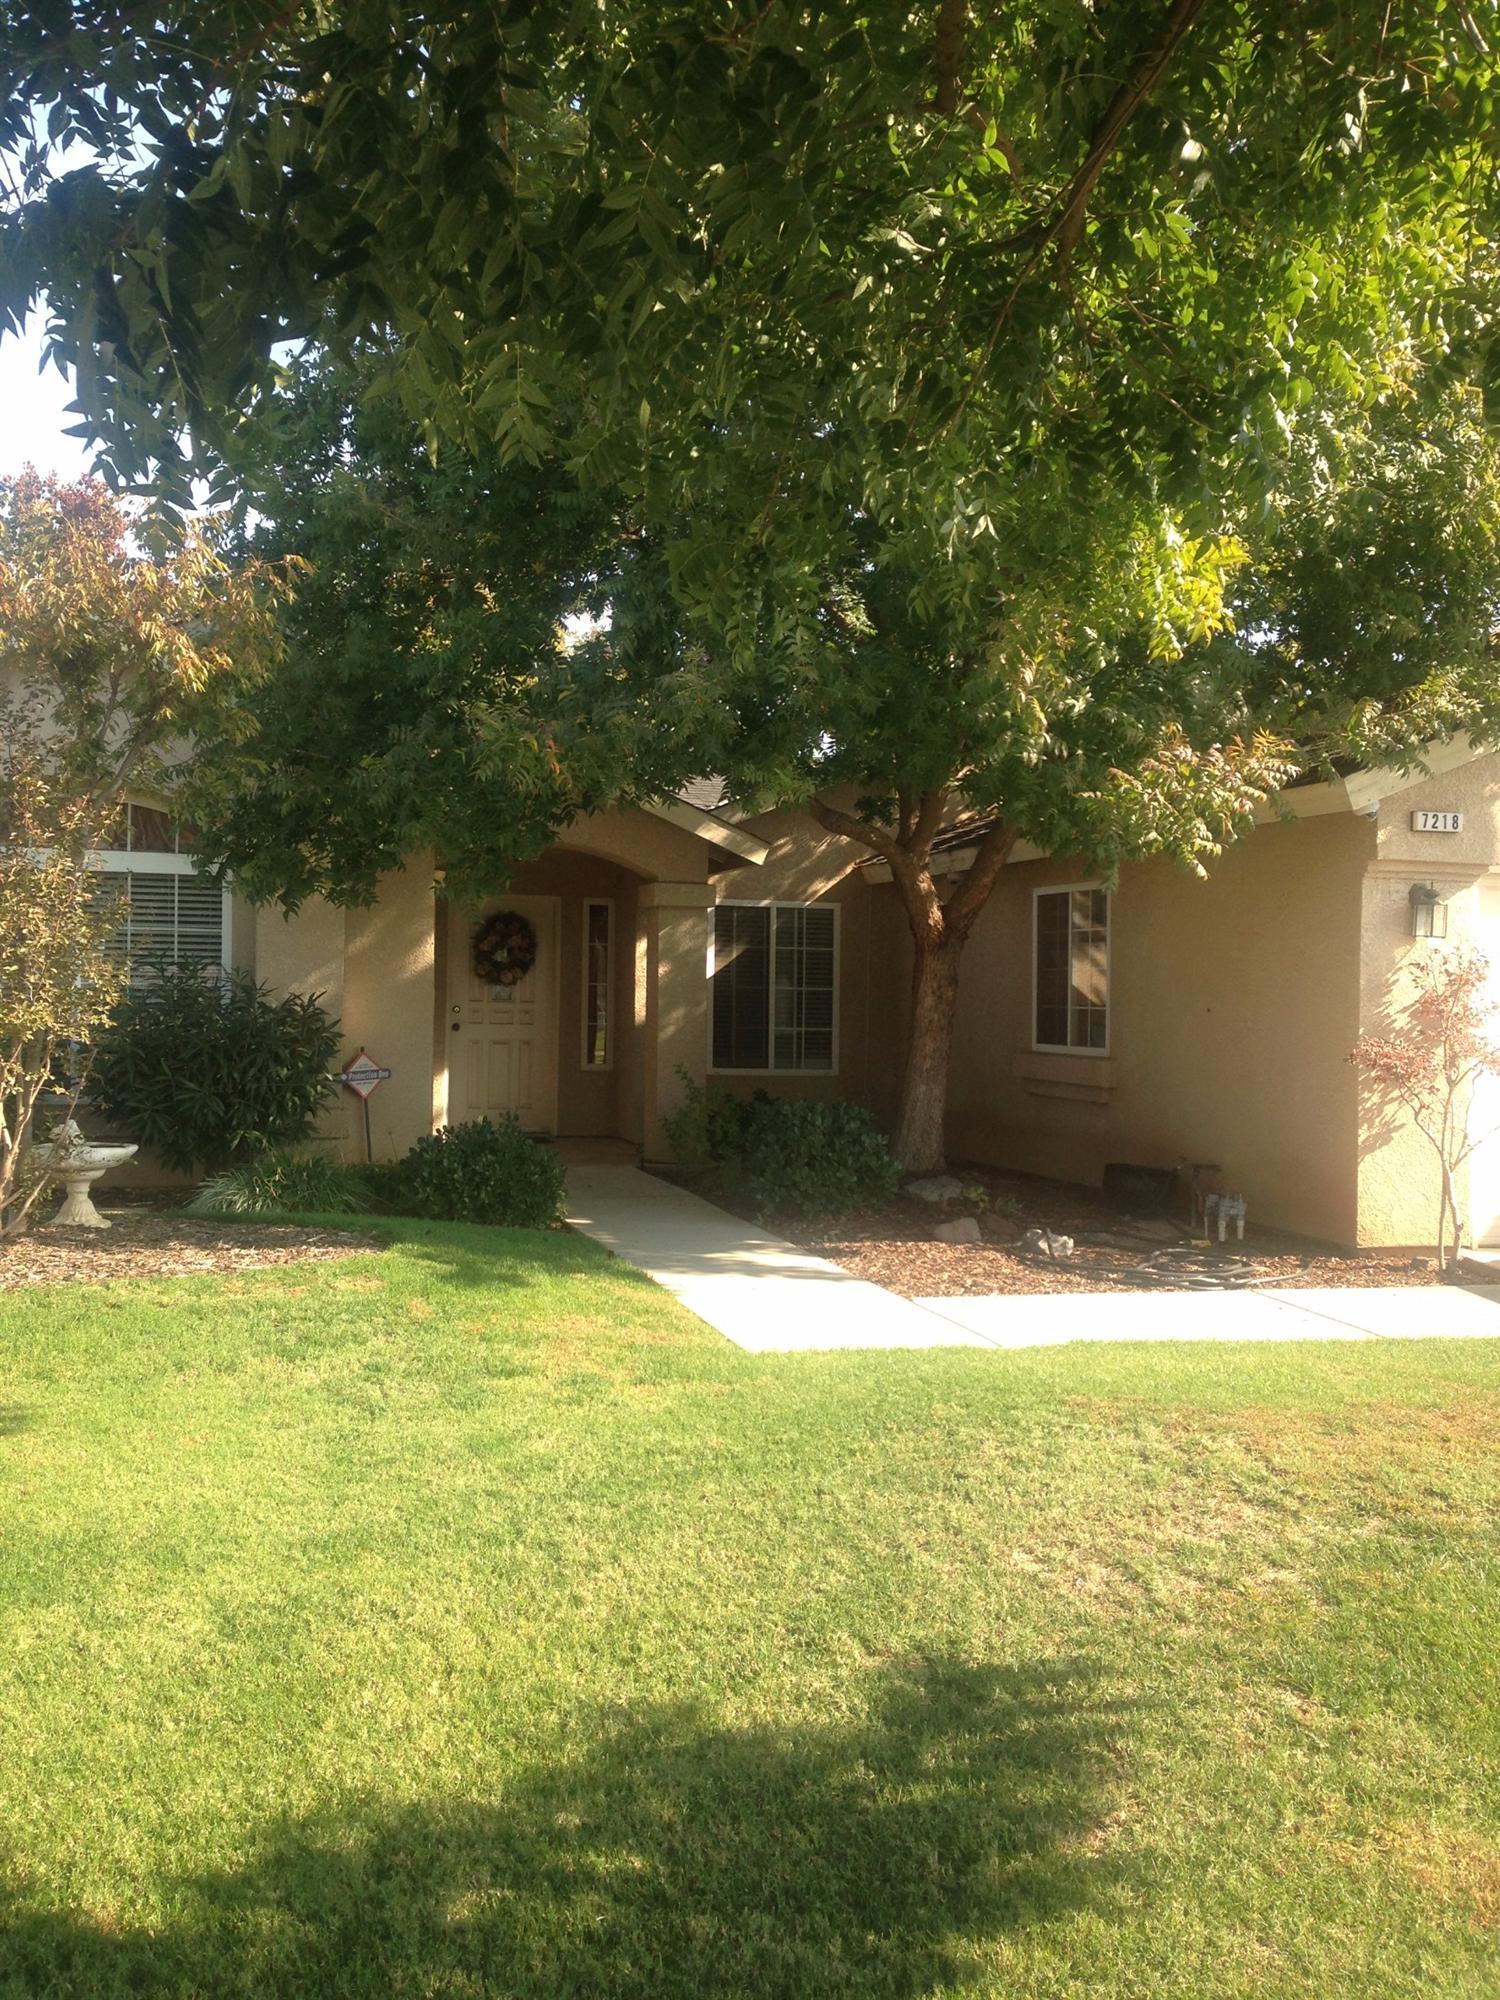 7218 N Adoline Ave, Fresno, CA